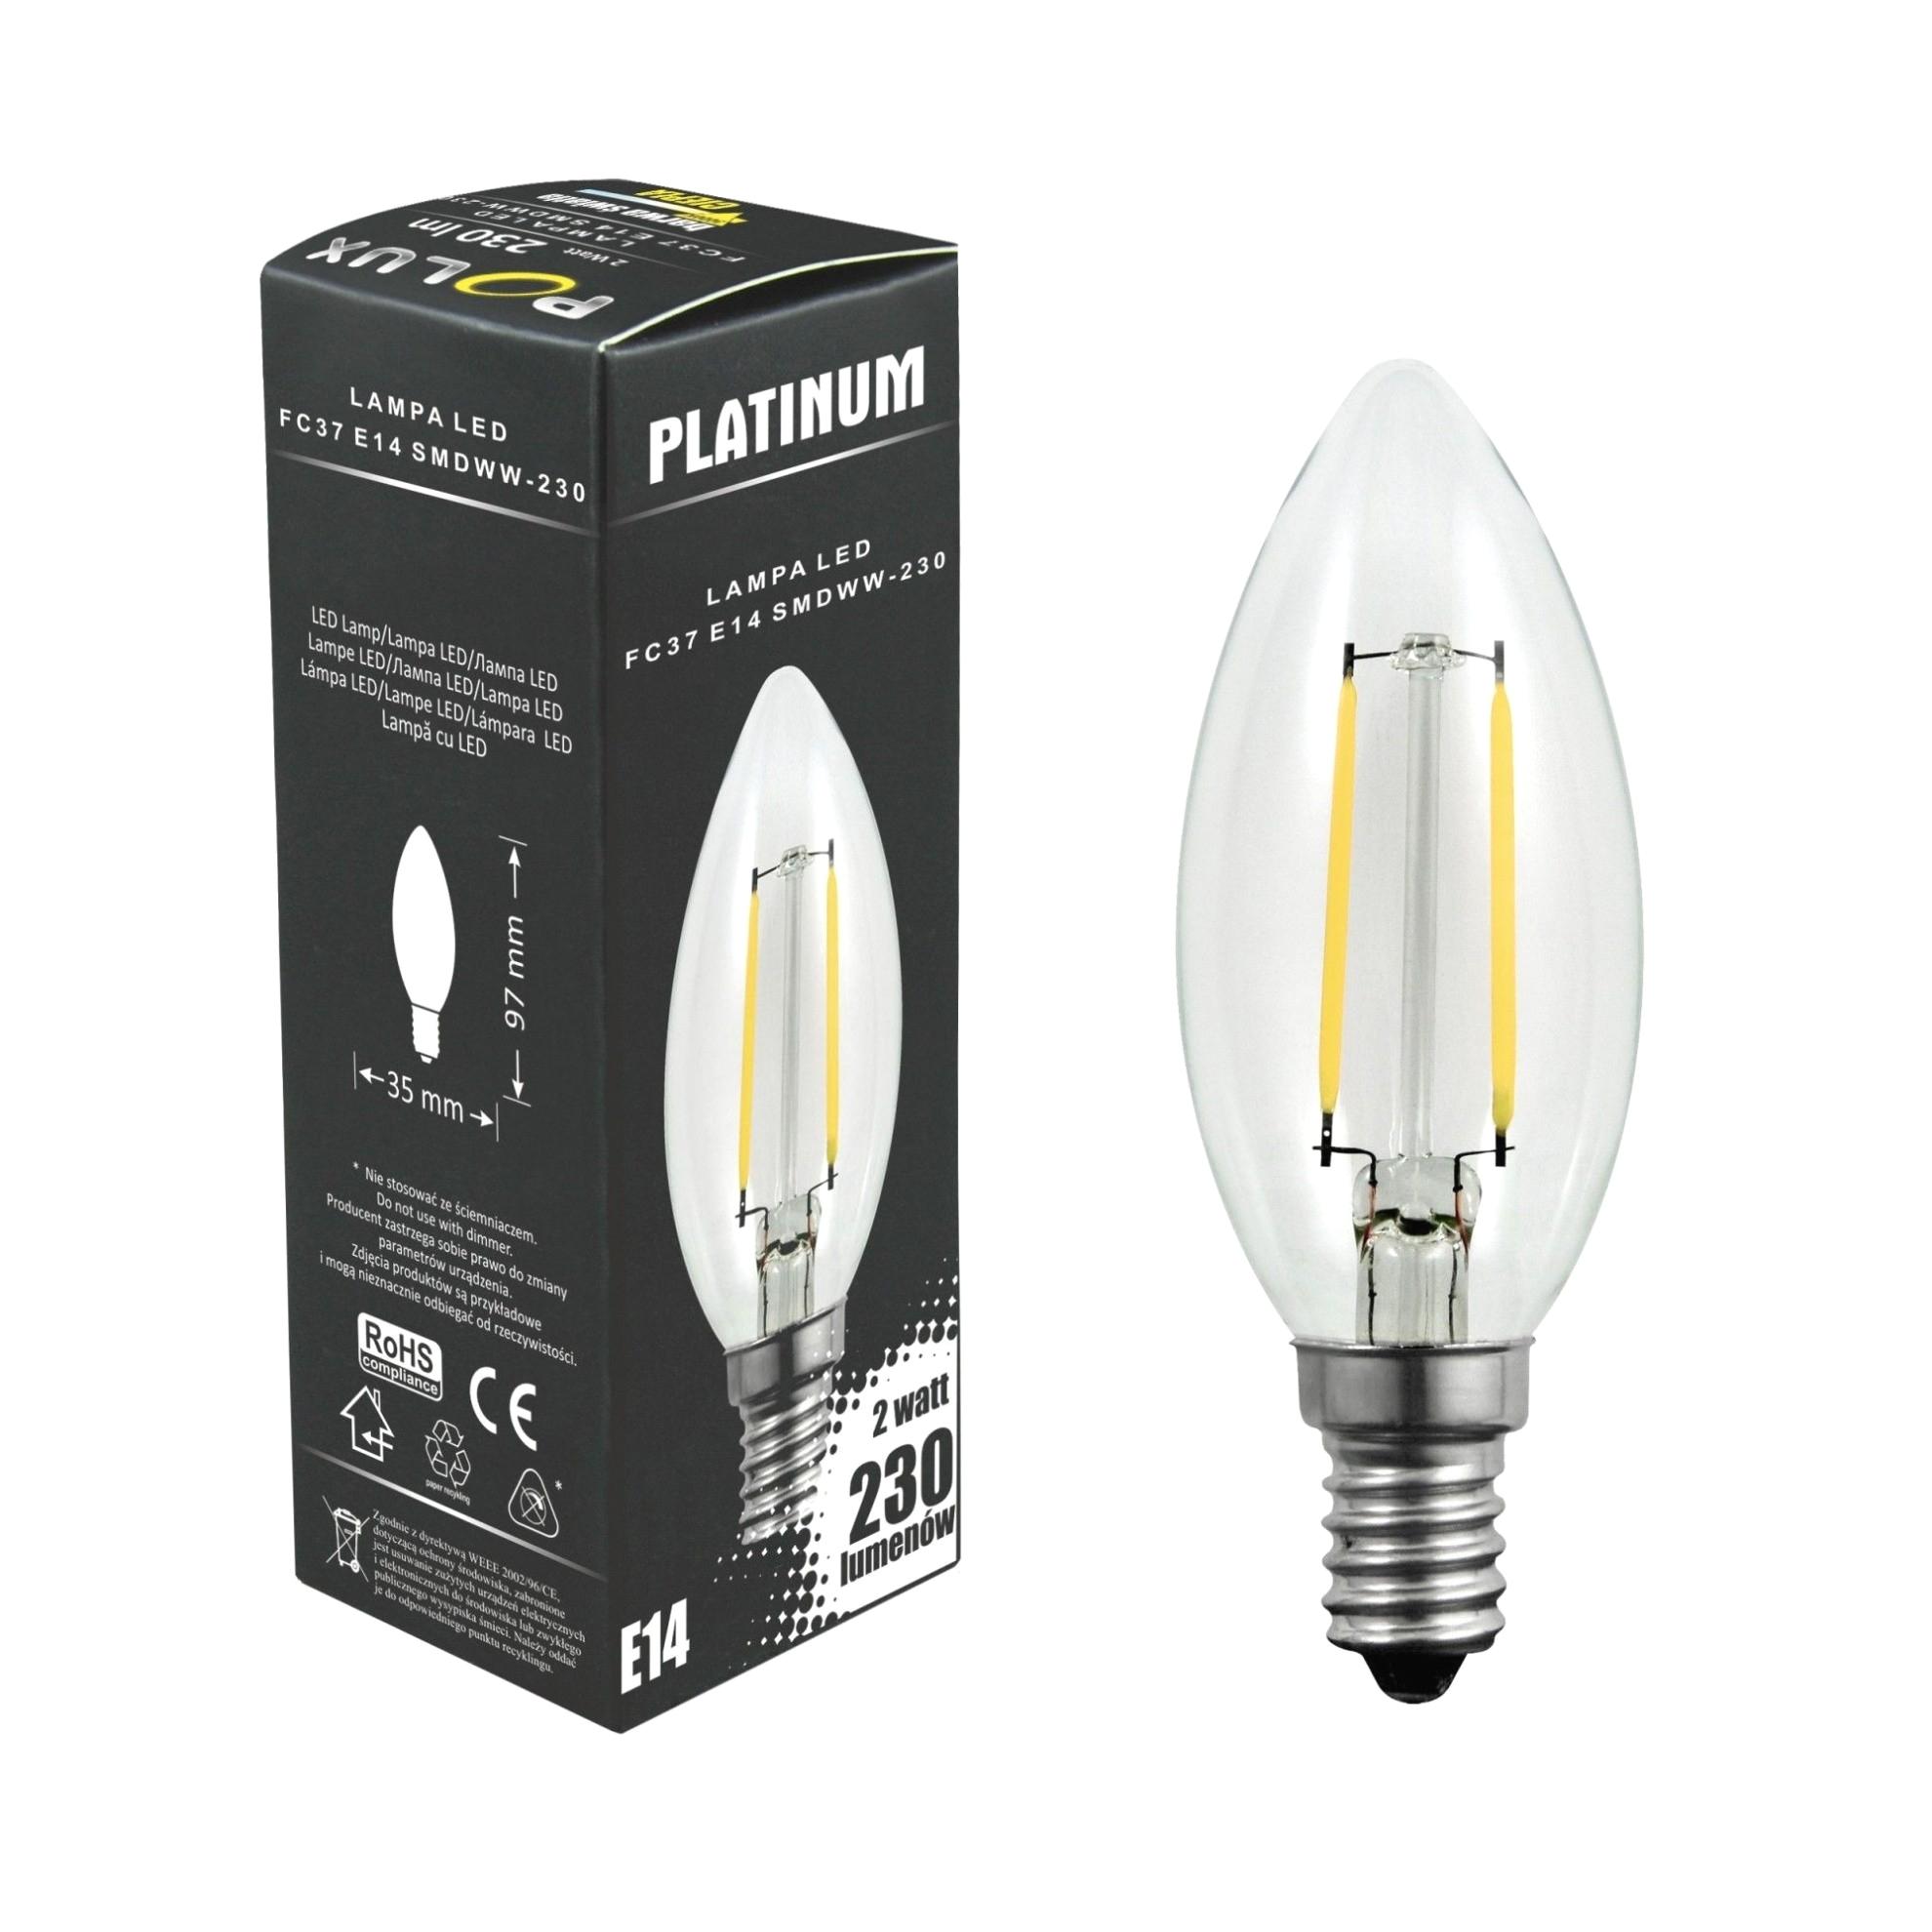 33 das beste von led lampen gu10 pic bogotaeslacumbre inicio avec haut 40 de lampe led